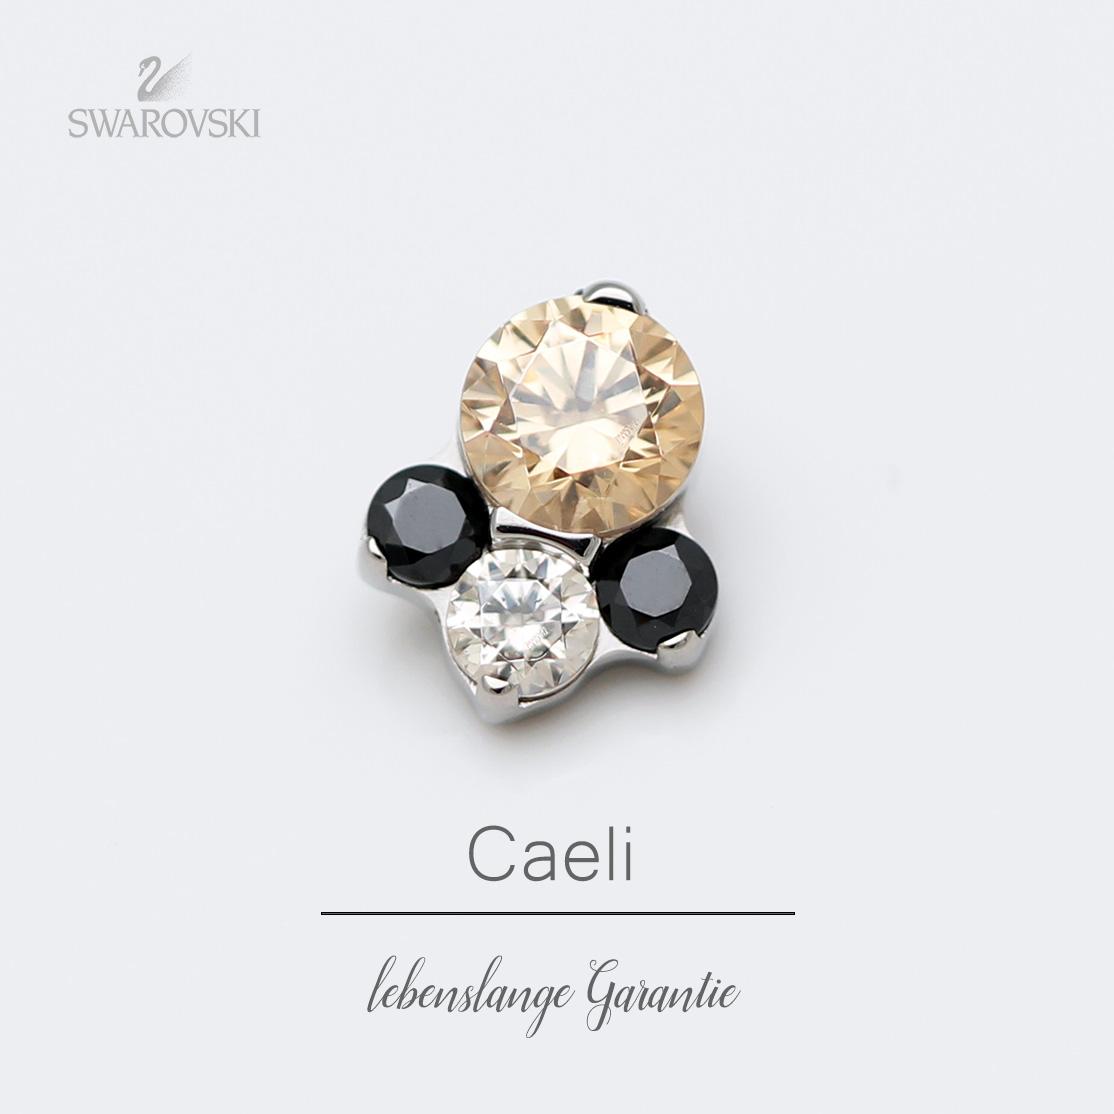 Industrial Strength Caeli